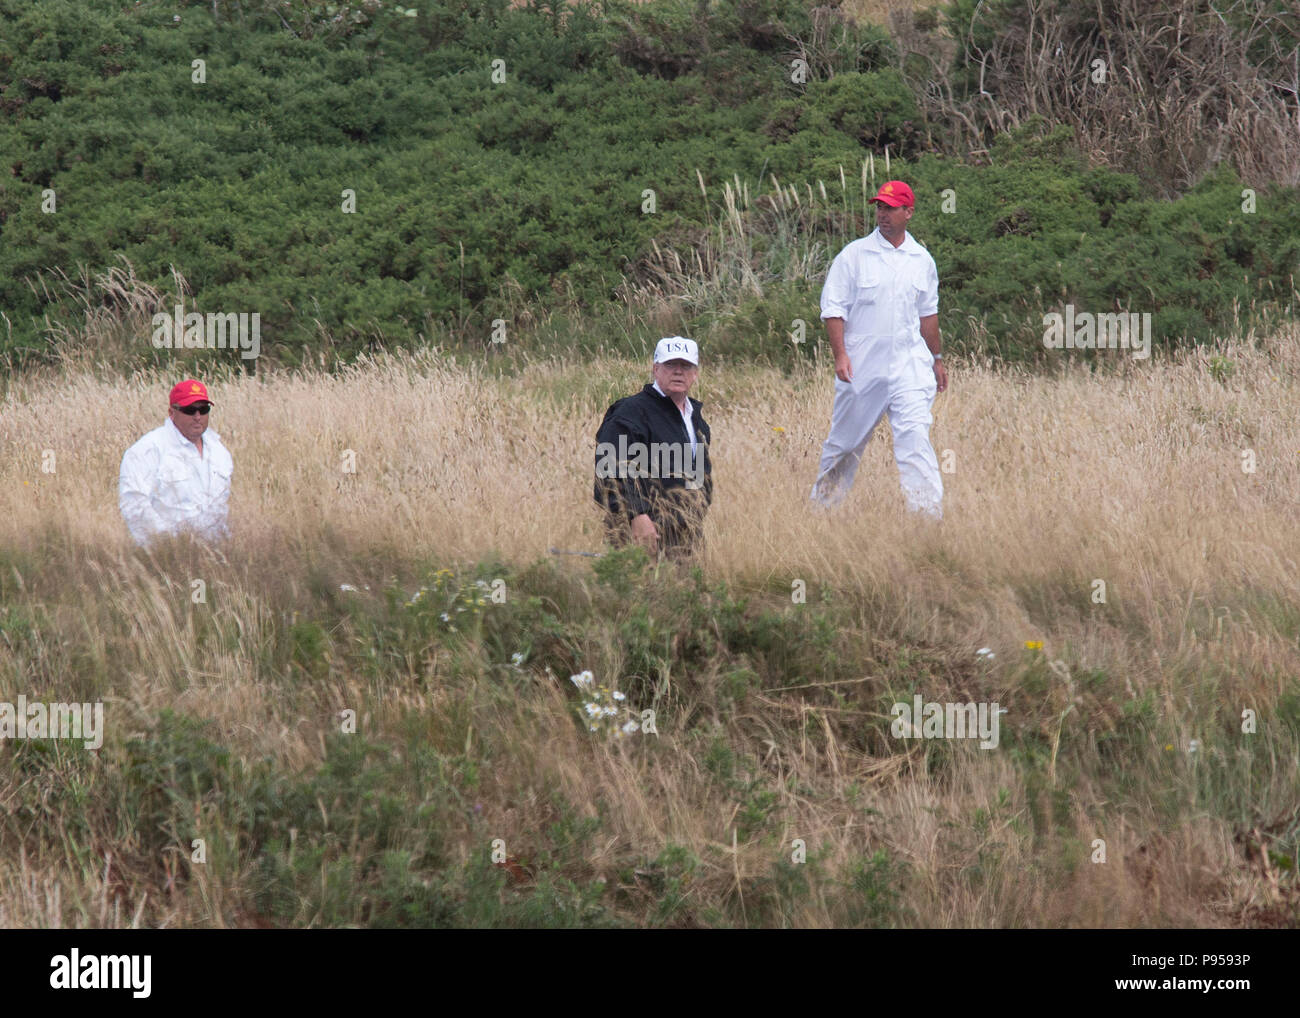 Presidente Donald Trump Trump Golf Resort en Turnberry en Ayrshire, Escocia, Reino Unido Imagen De Stock